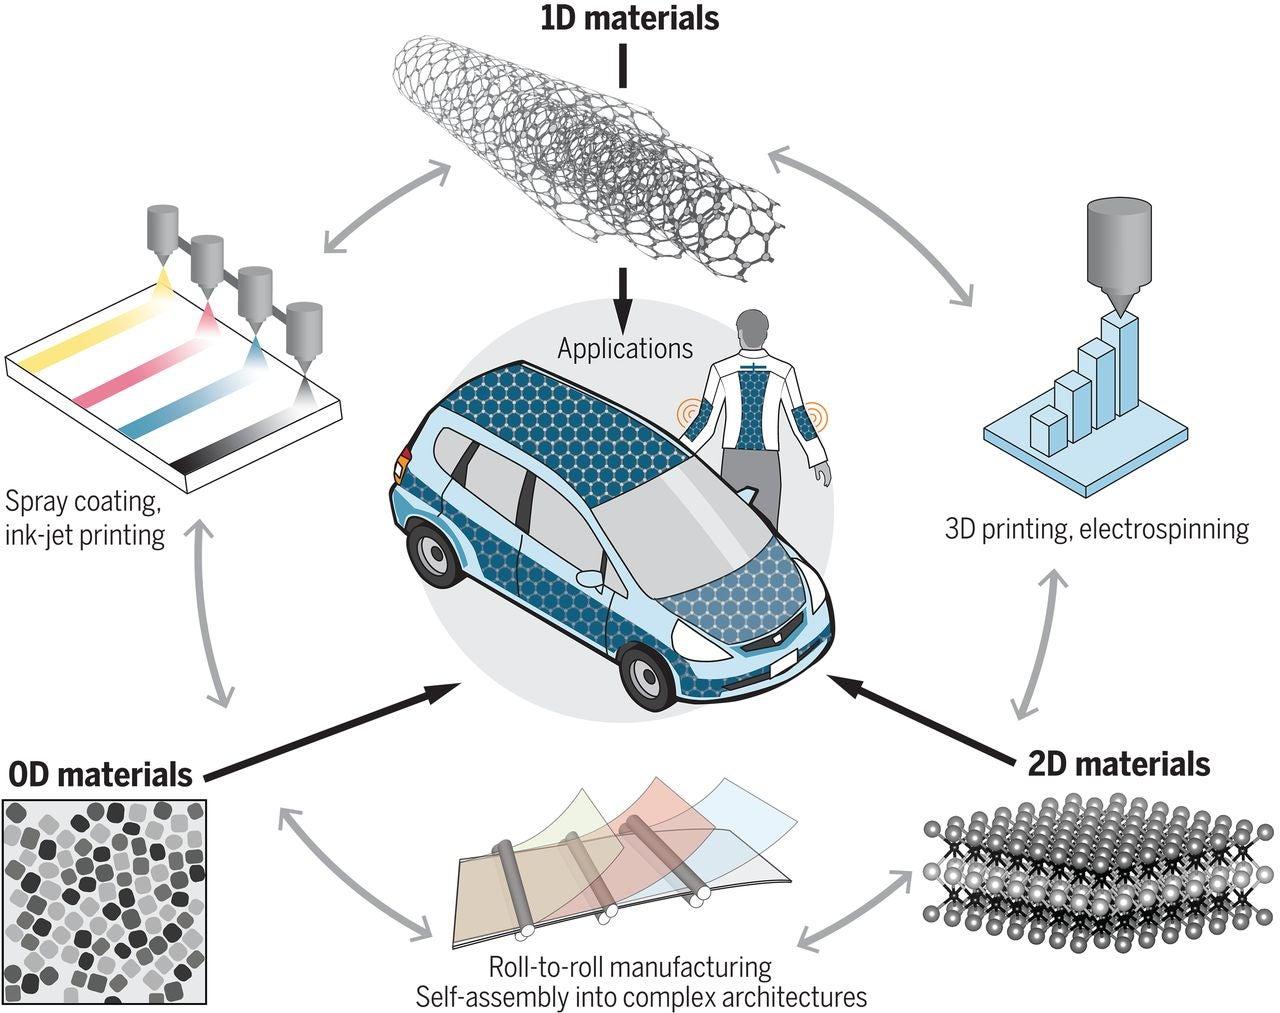 nanomaterials for energy storage